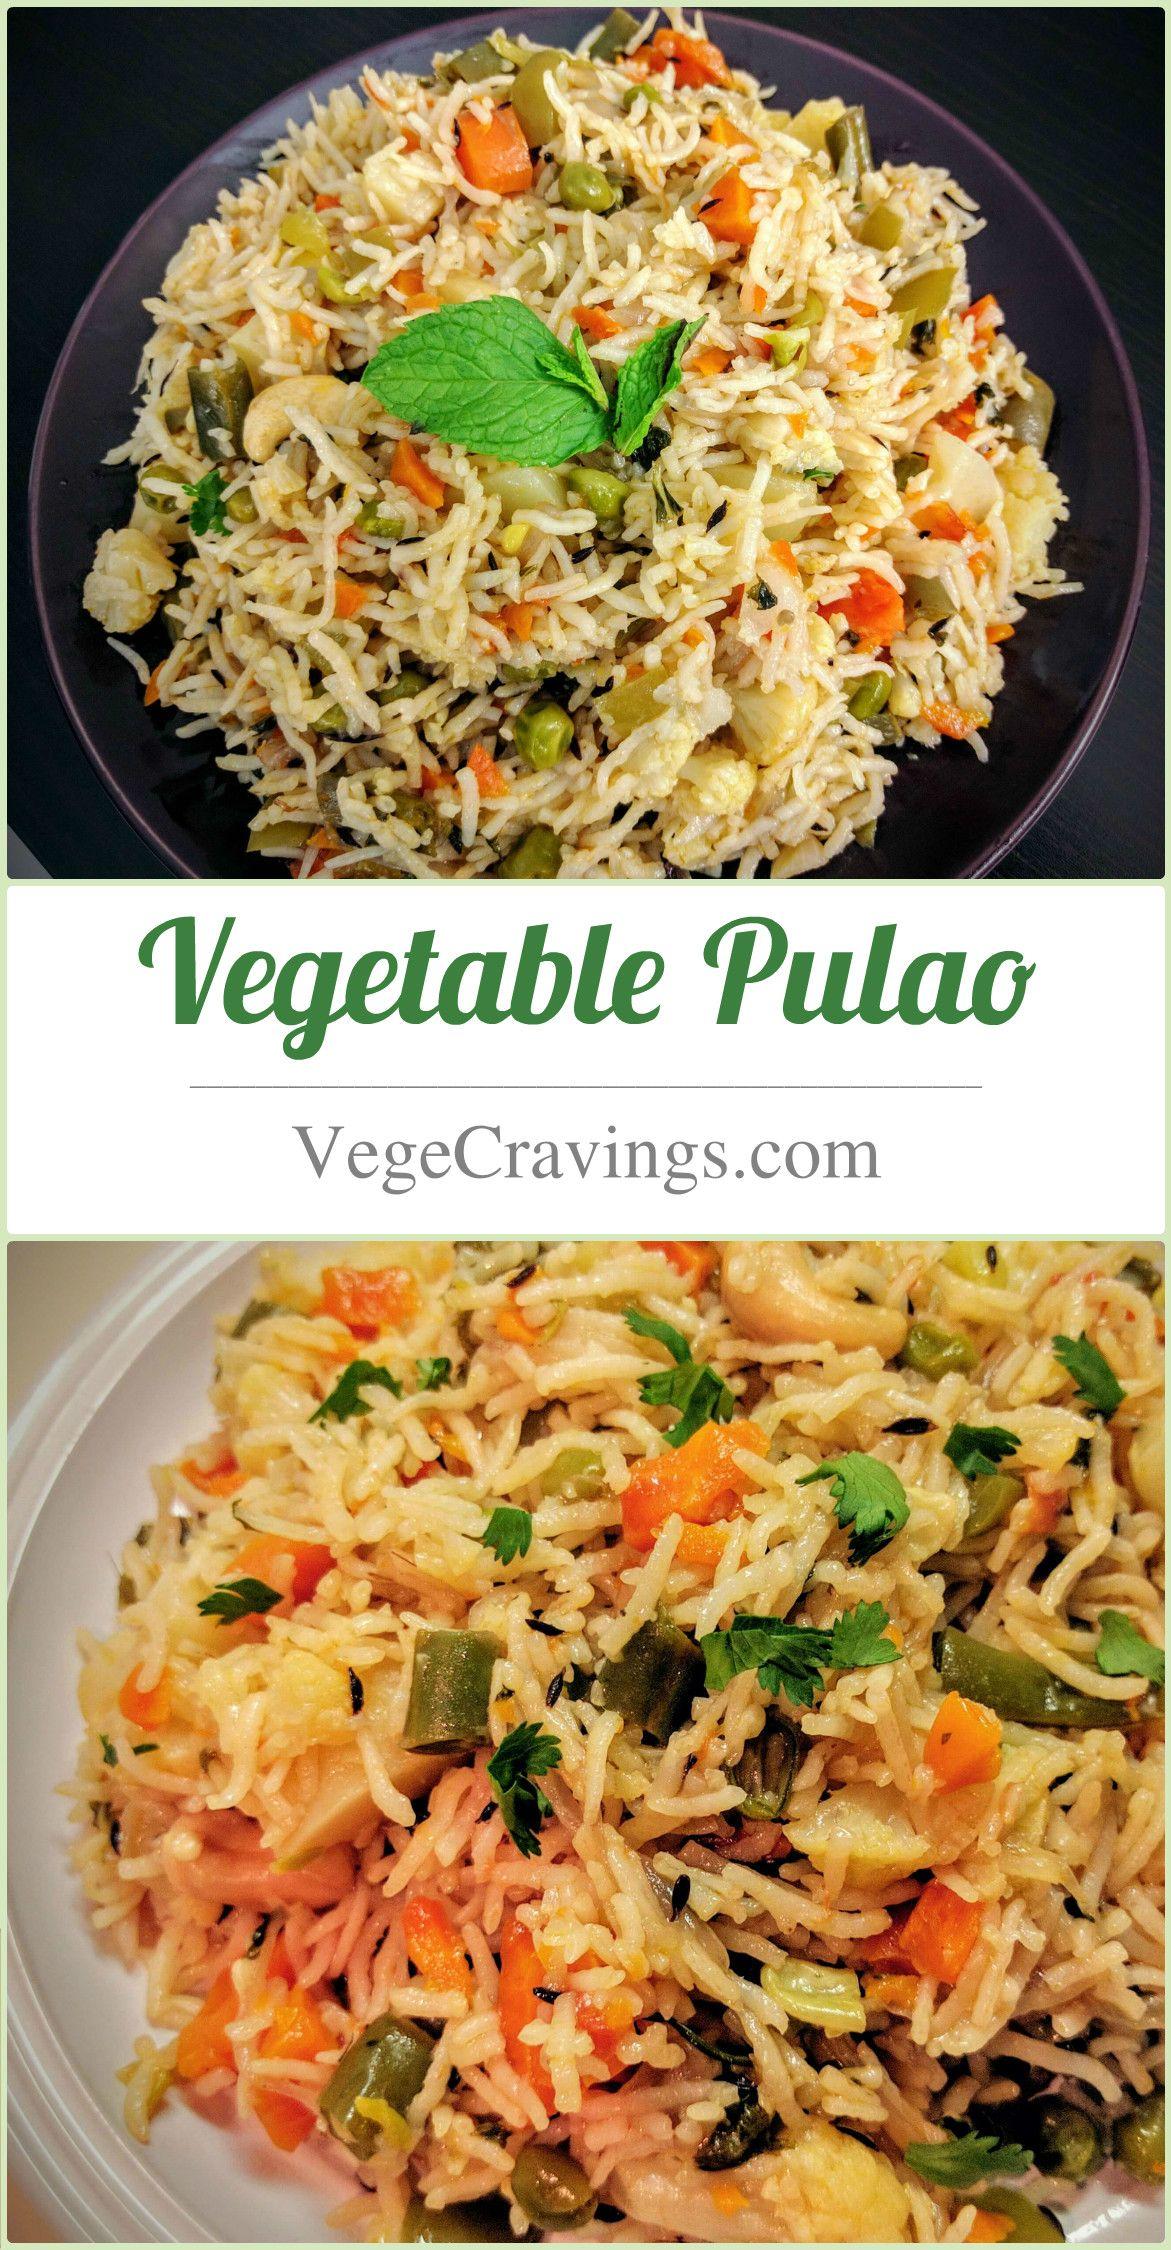 Veg Pulao Recipe Vegetable Pilaf